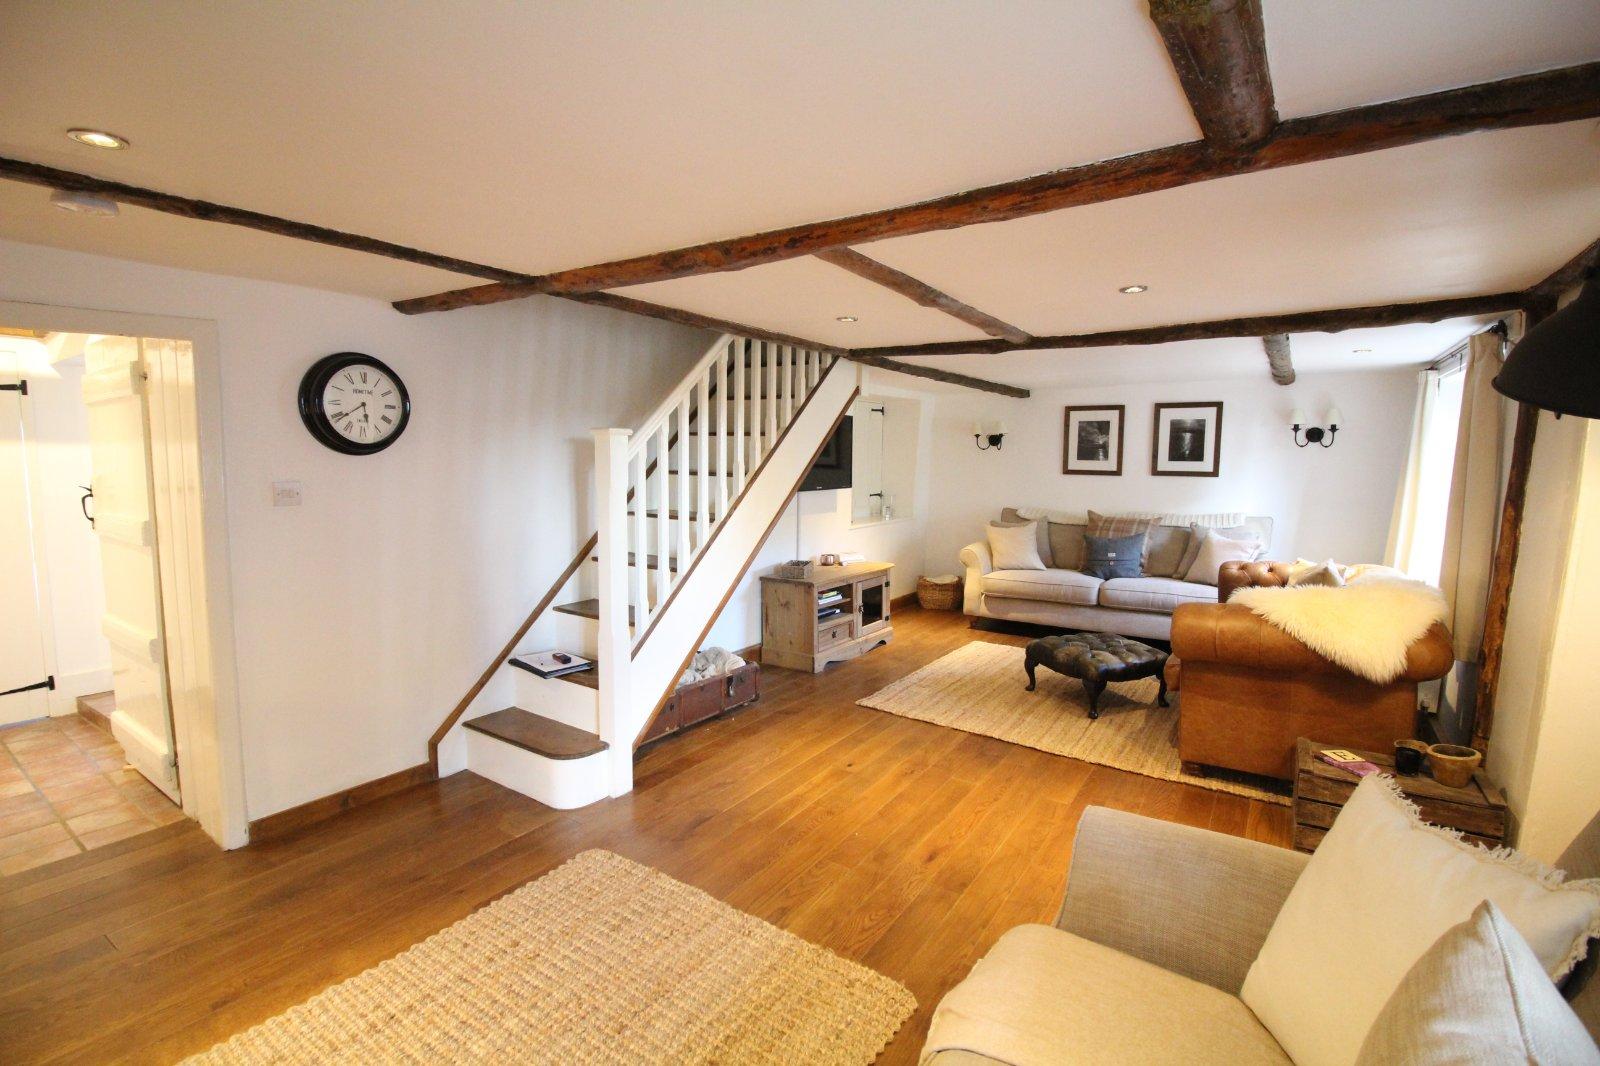 3 bed house to rent in Wareham Road, Lytchett Matravers  - Property Image 1